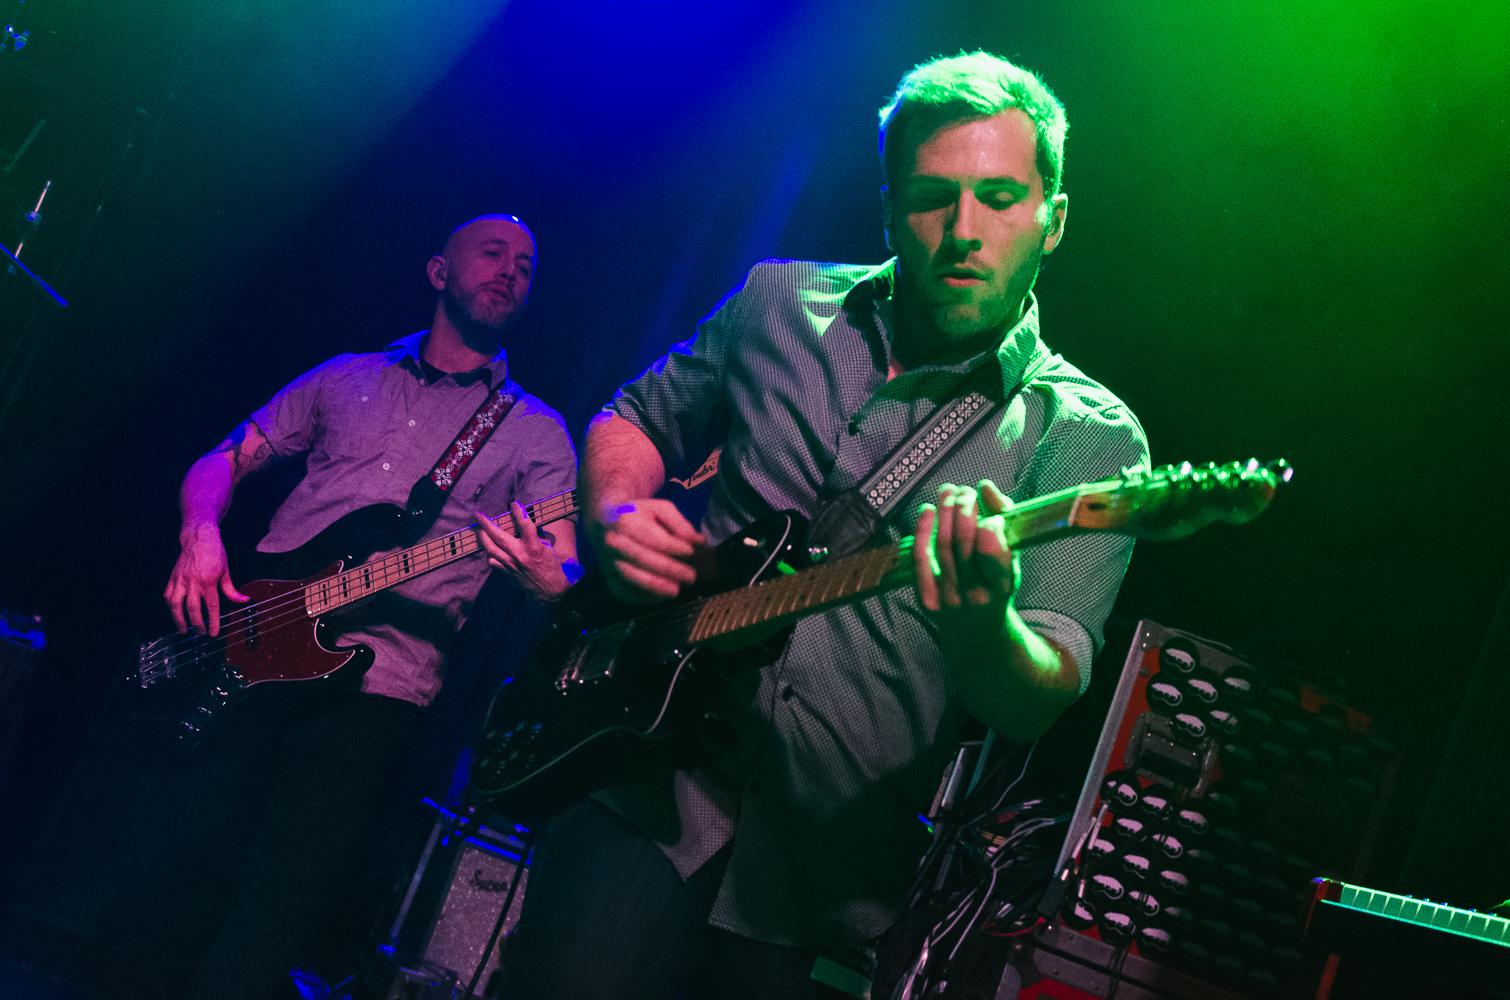 Taking Back Sunday at Irving Plaza Ben Kaye First Three Albums 20th Anniversary